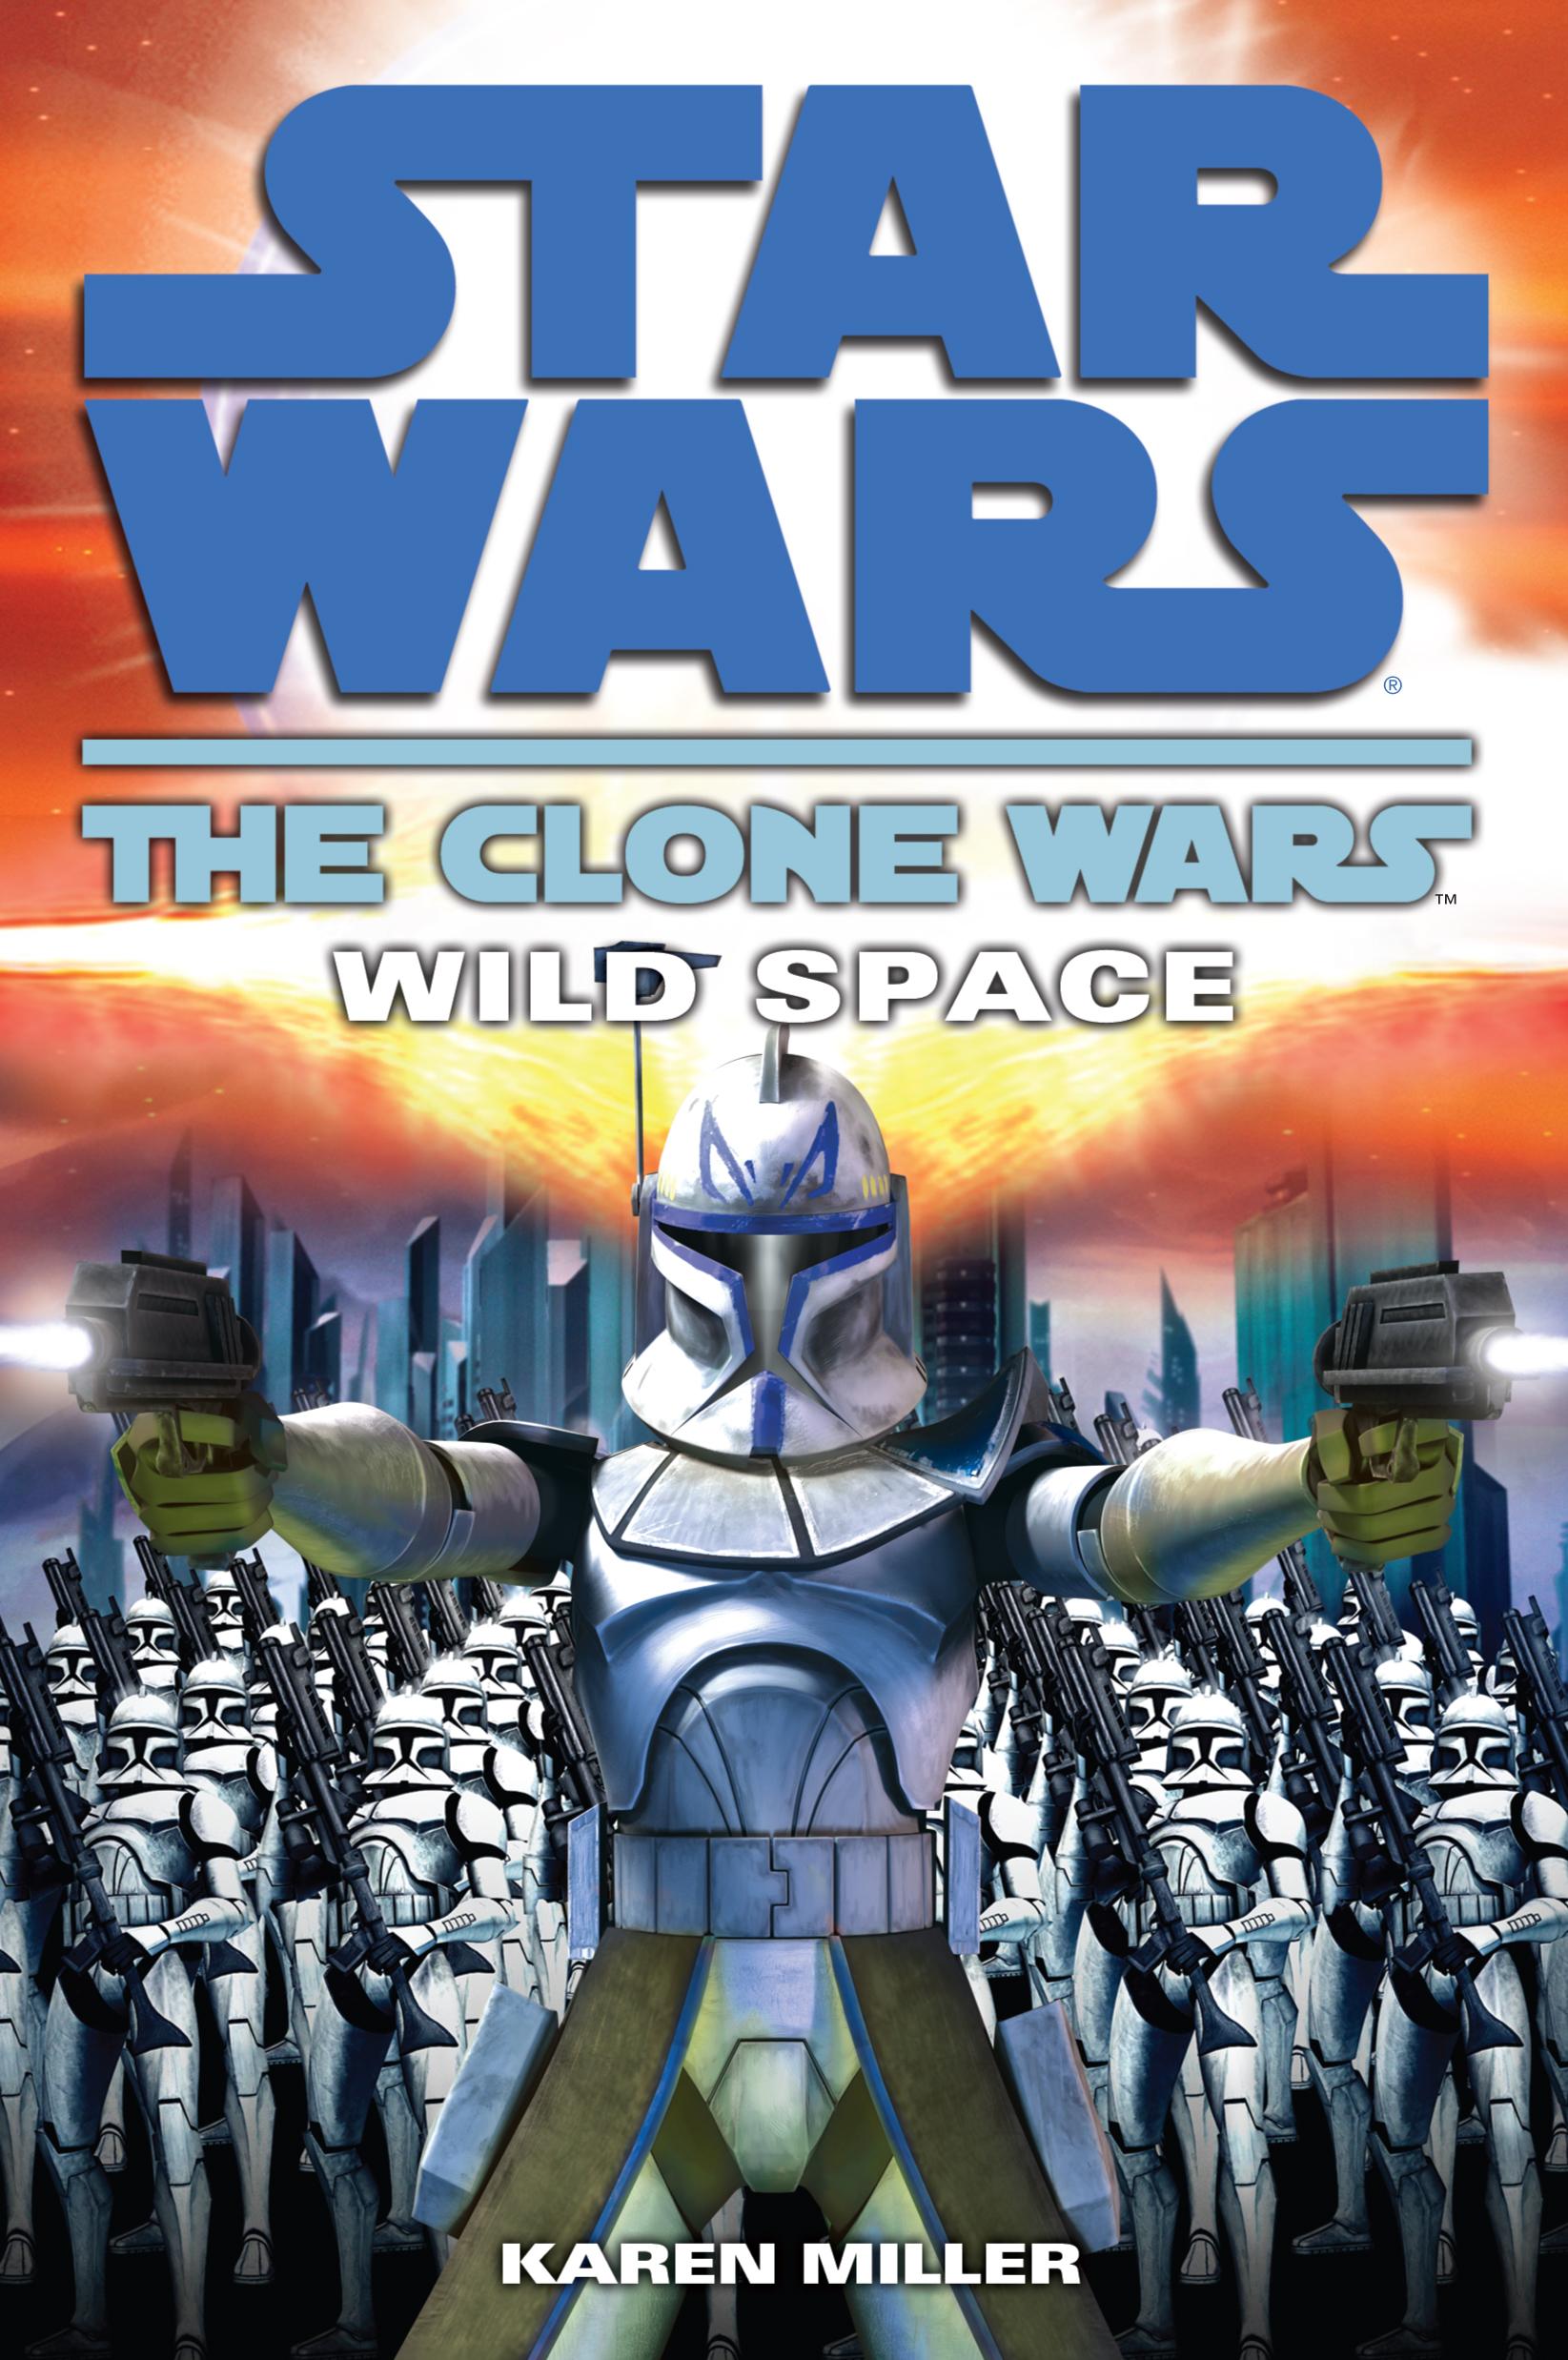 Star Wars The Clone Wars Bs